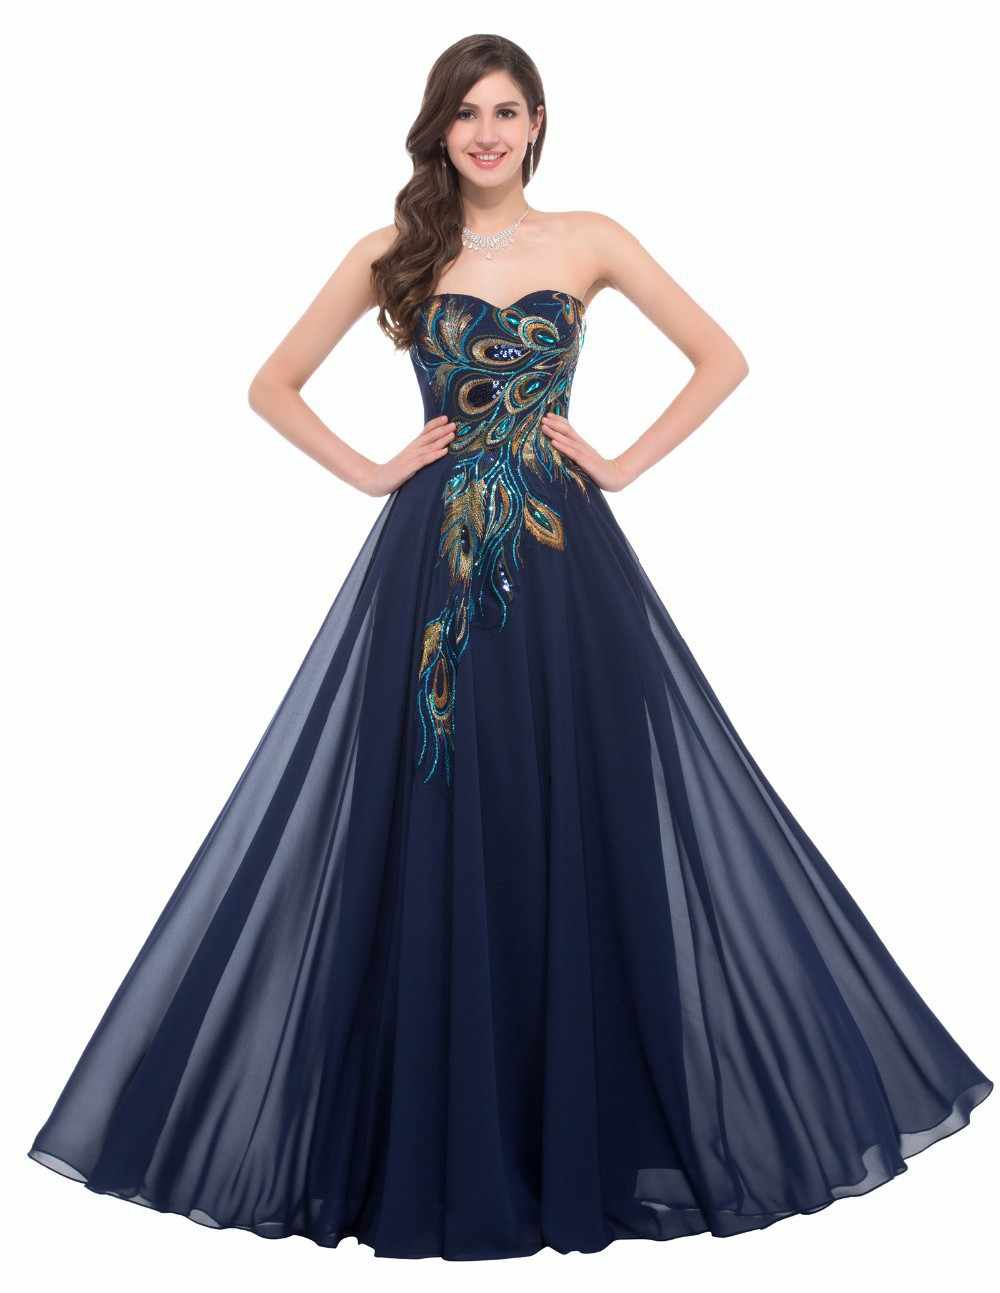 xunyAng Vintage Strapless peacock Embroidery 5 colors elegant tea length  Long Evening Dress vestidos de noche 6b0af7d8ef9b